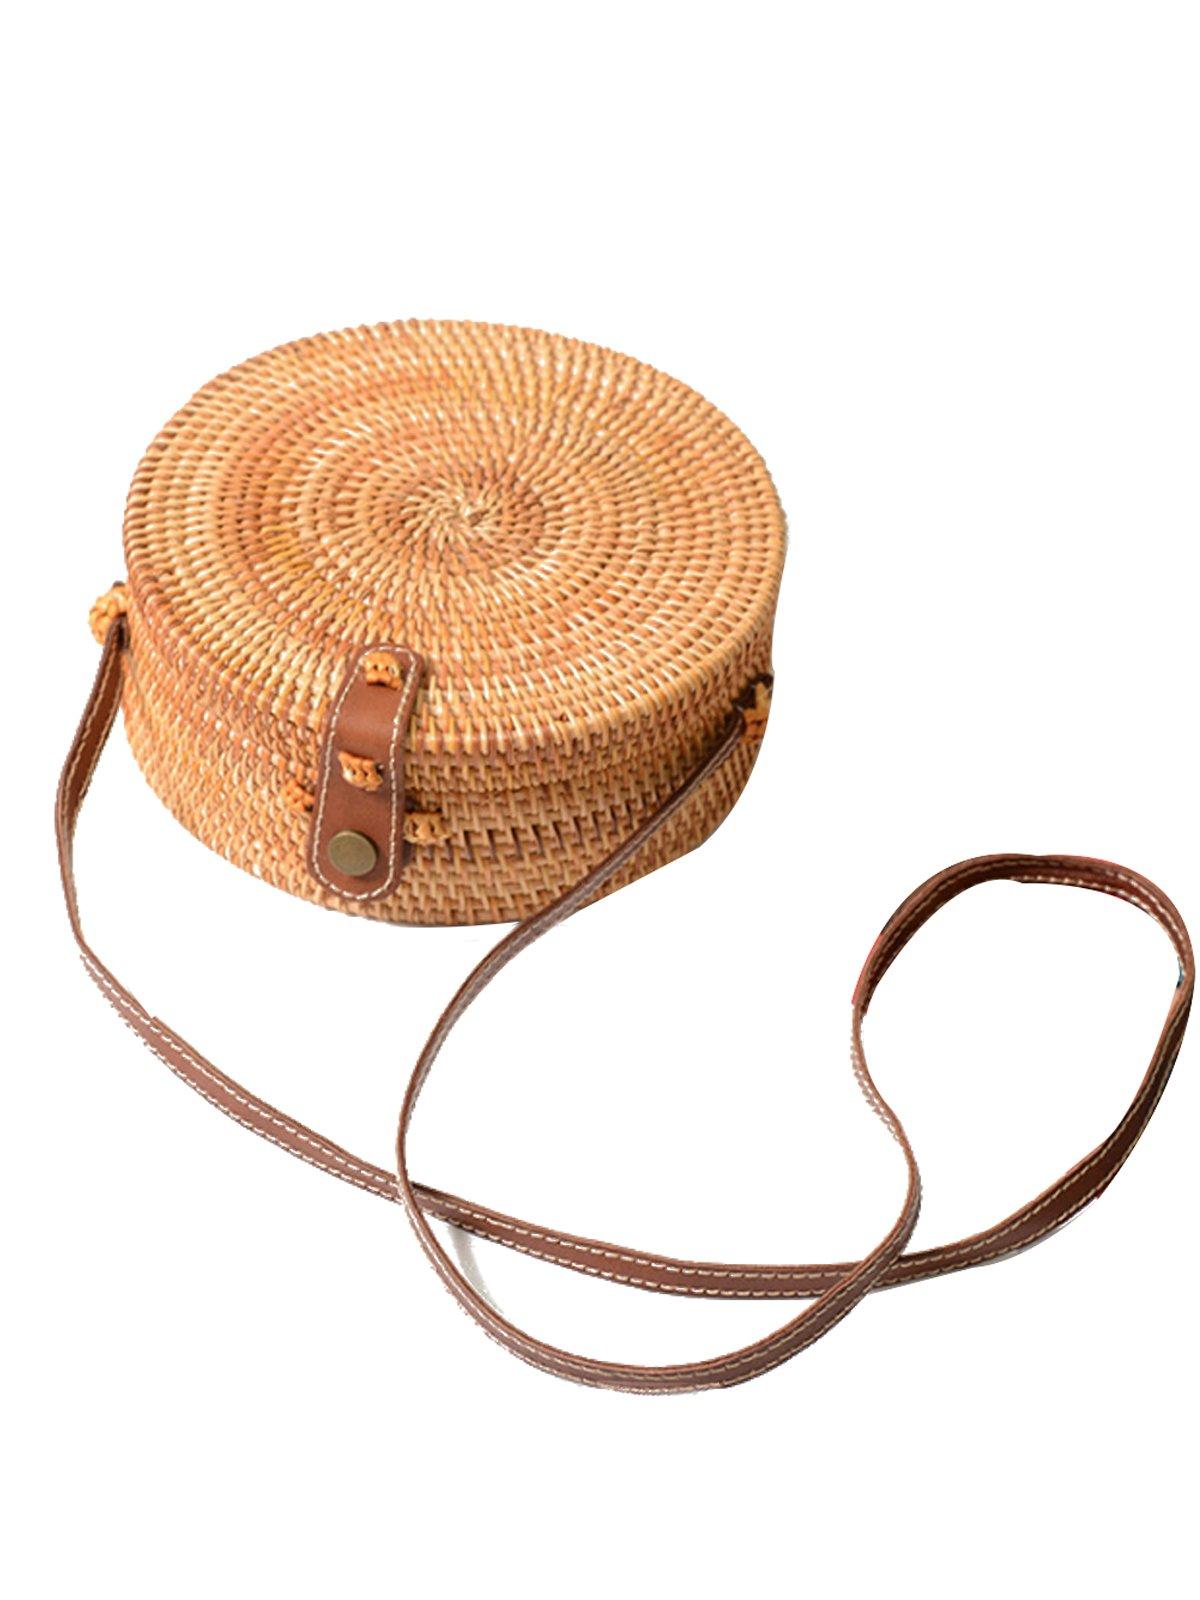 PORALA Round Woven Ata Rattan Bag Summer Beach Purse Straw Bali Bag Crossbody Shoulder Bag, Handwoven Handbag